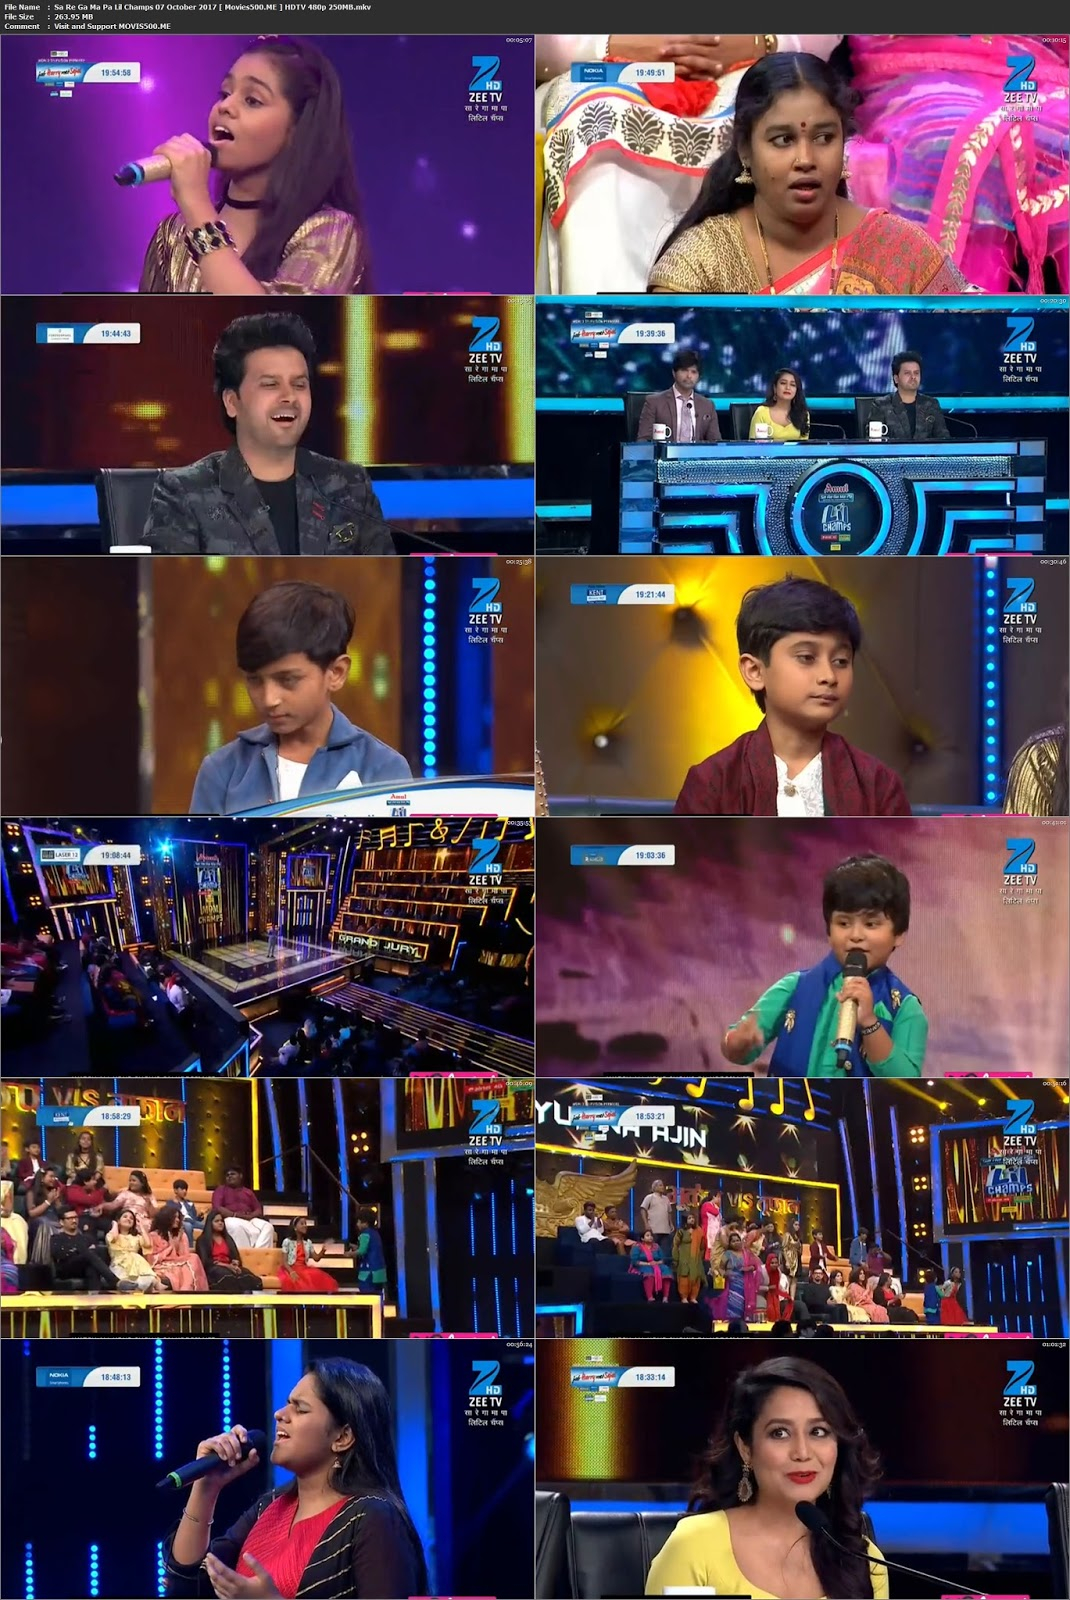 Sa Re Ga Ma Pa Lil Champs 07 October 2017 HDTVRip 480p at softwaresonly.com